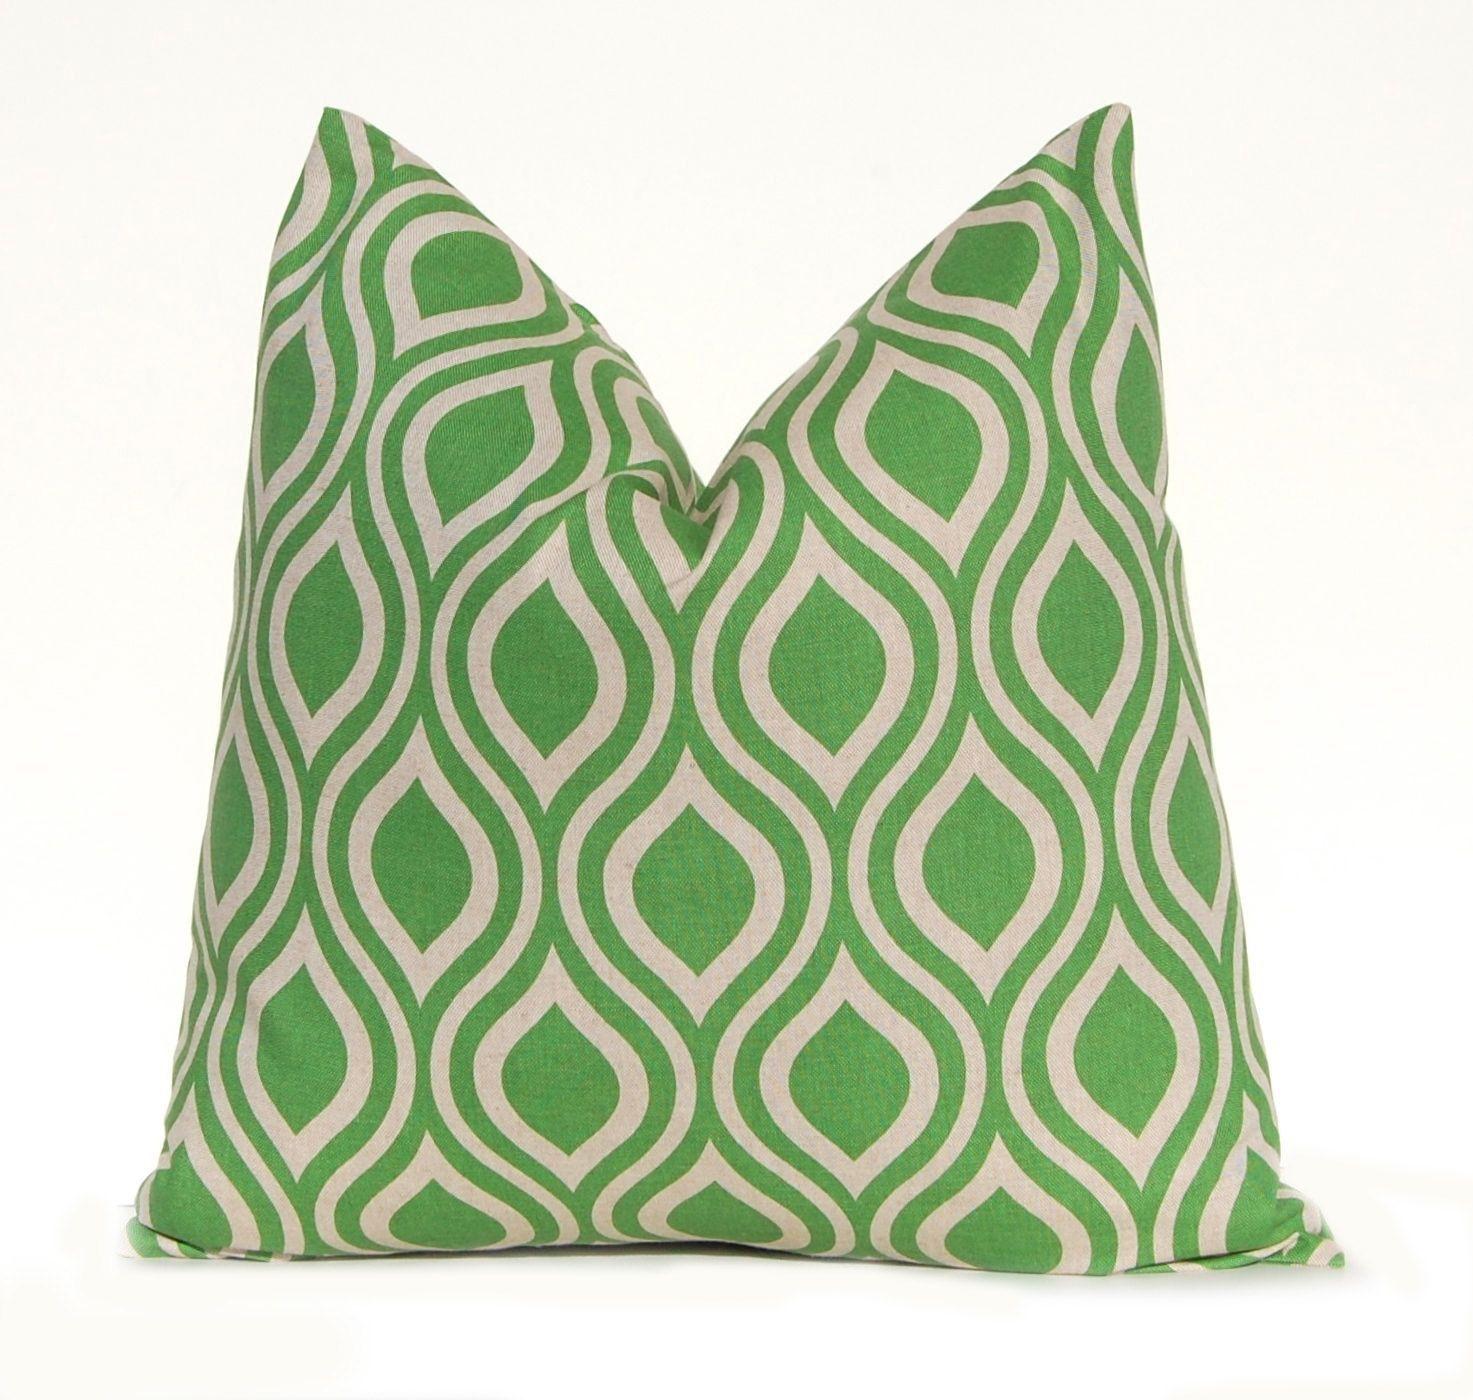 Euro Sham Decorative Throw Pillow Cover 24 x 24 Green on Linen